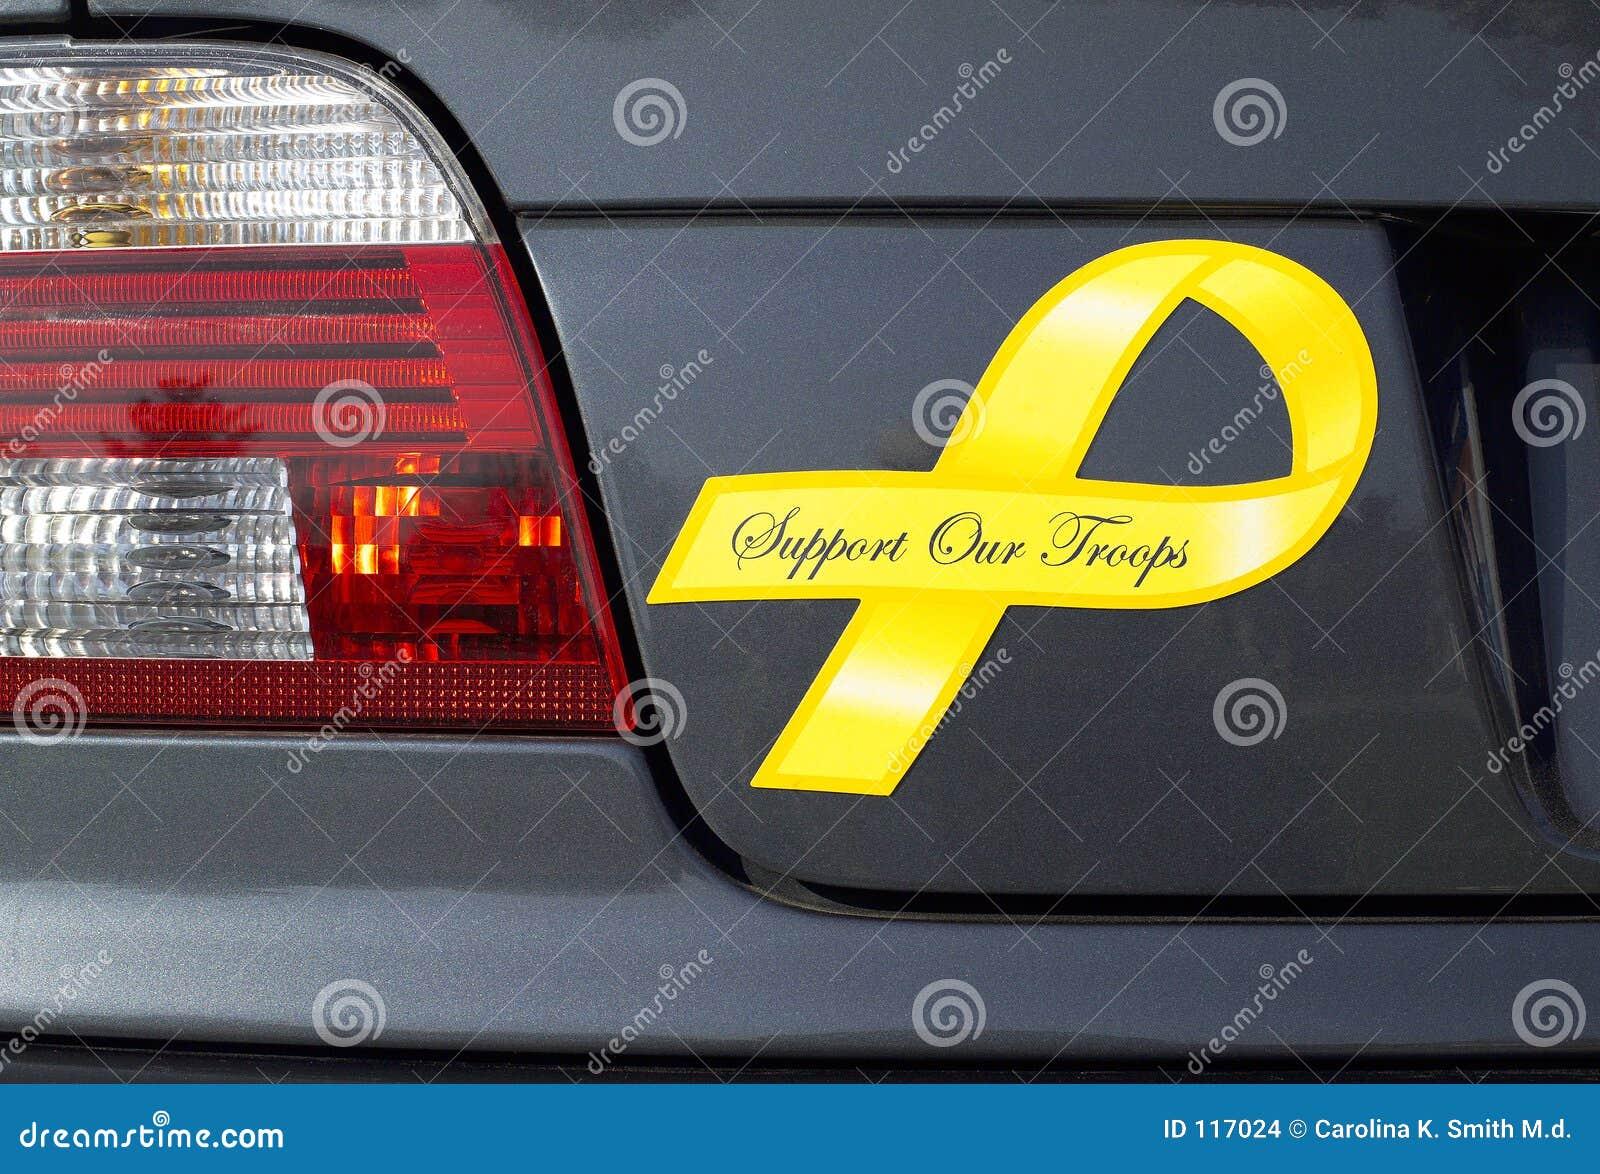 Troops Yellow Ribbon